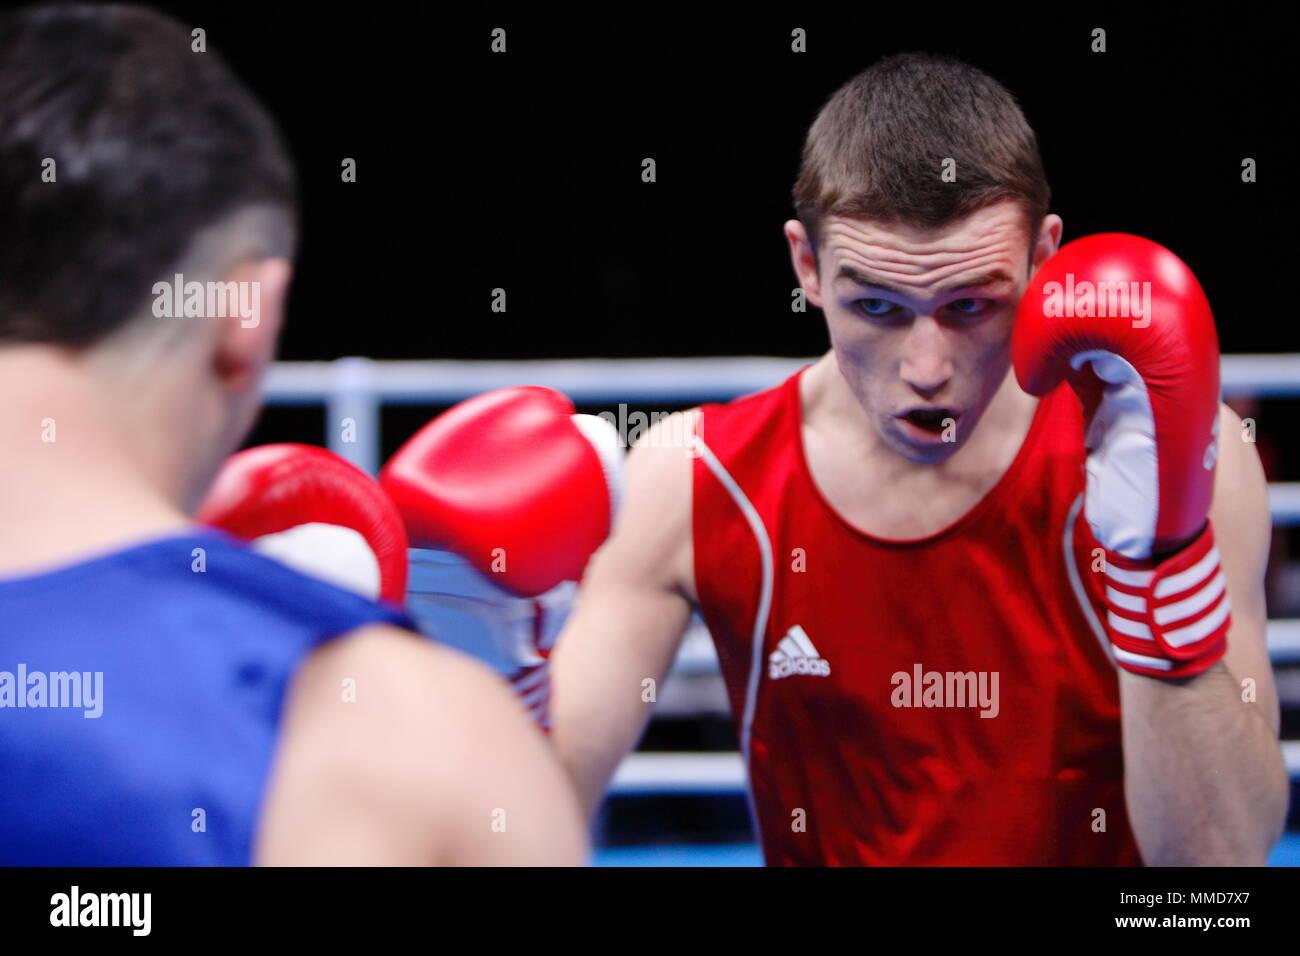 Profesional vs amateur olympics